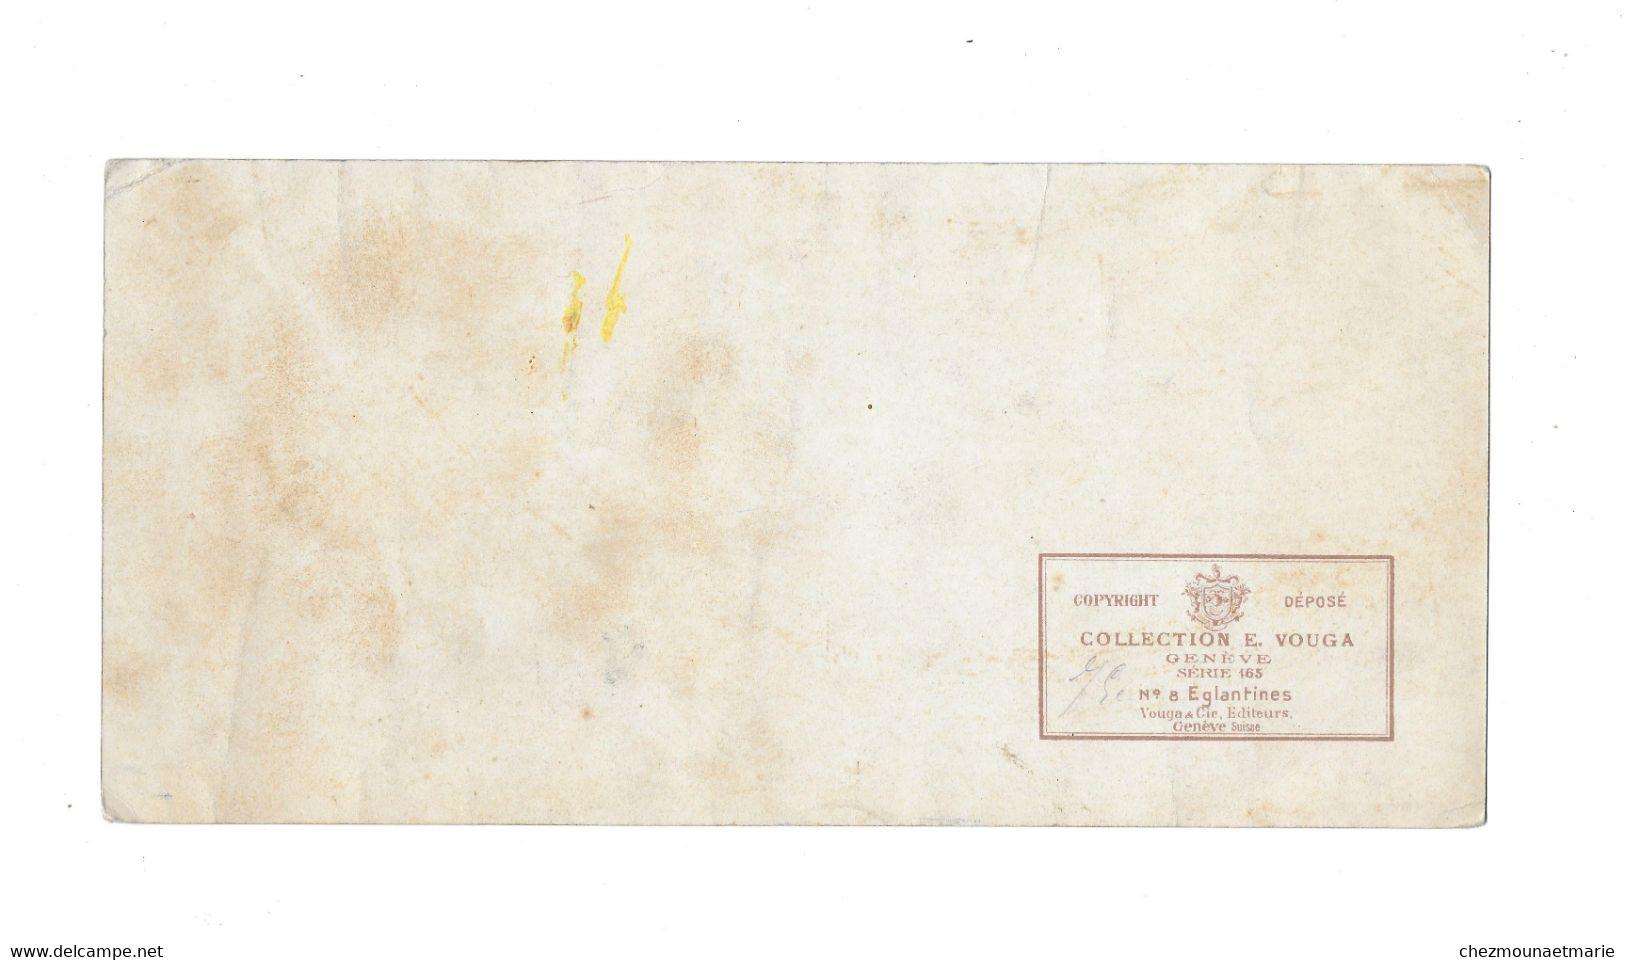 E. VOUGA - GENEVE SERIE 156 N°8 EGLANTINES - GENEVE - CARTE 25*12 CM - B. Bloemplanten & Bloemen